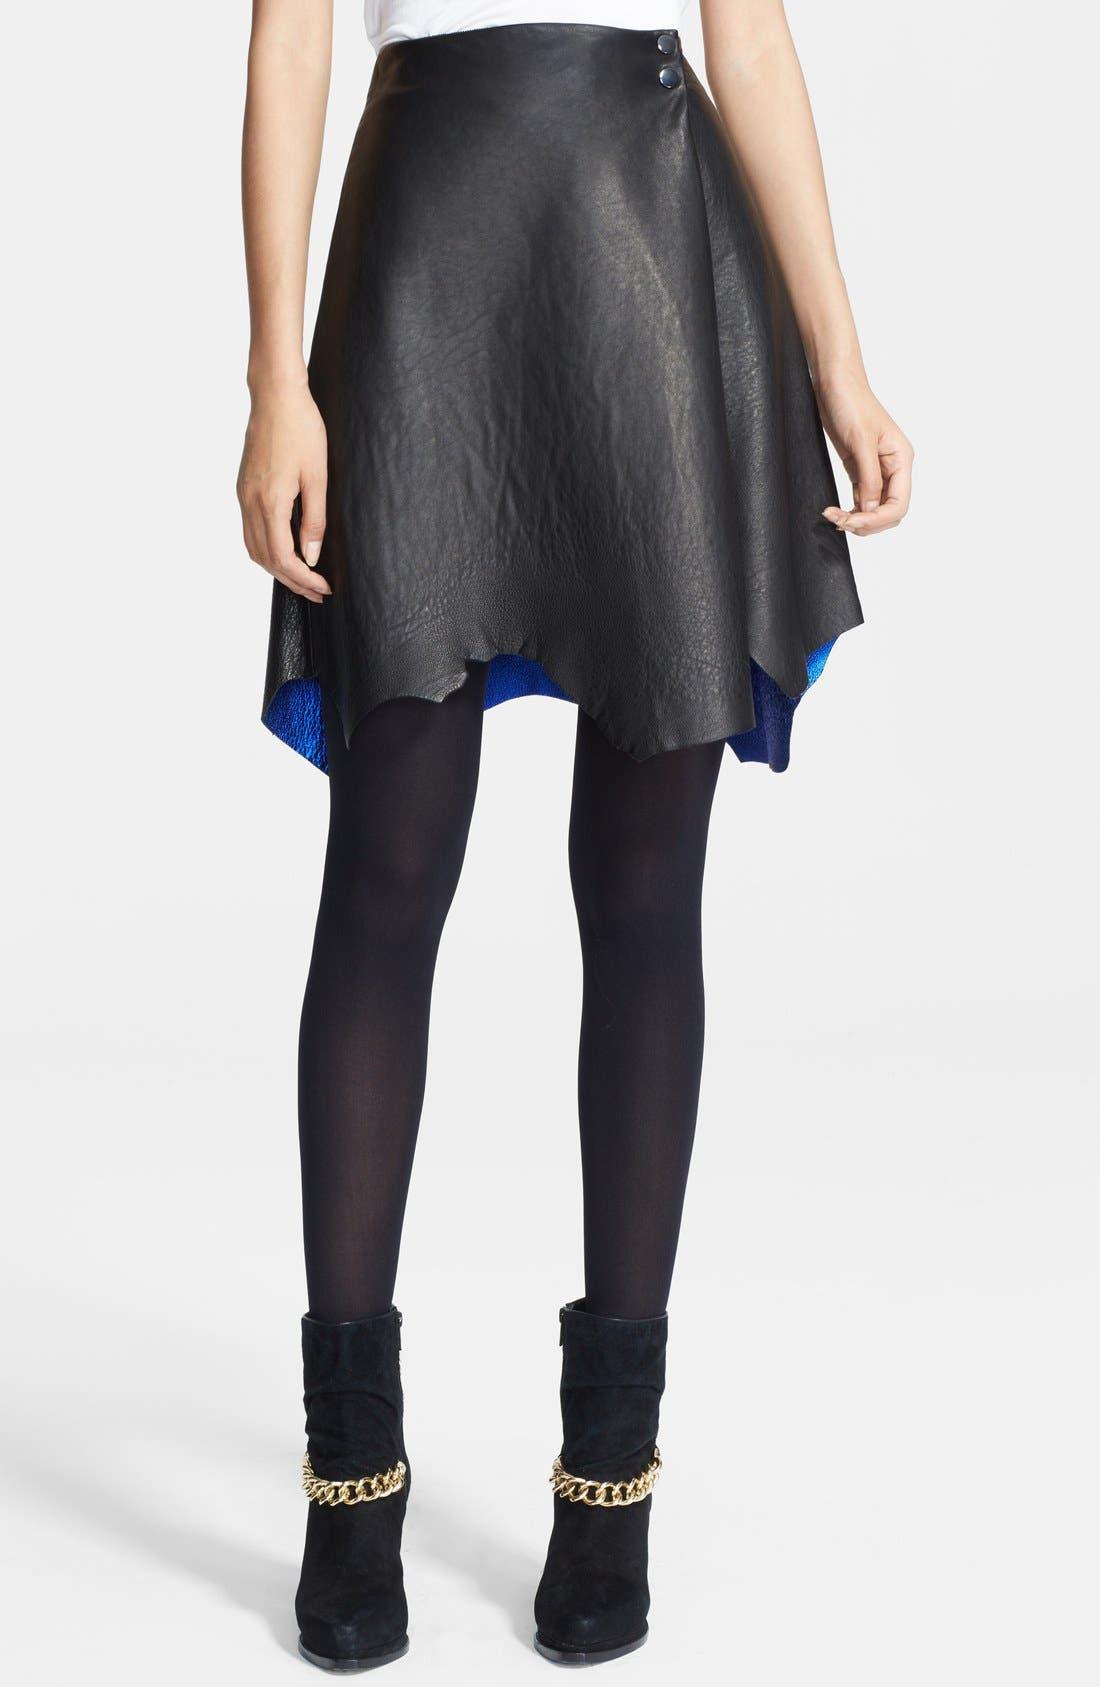 Alternate Image 1 Selected - 3.1 Phillip Lim Raw Hem Leather Skirt